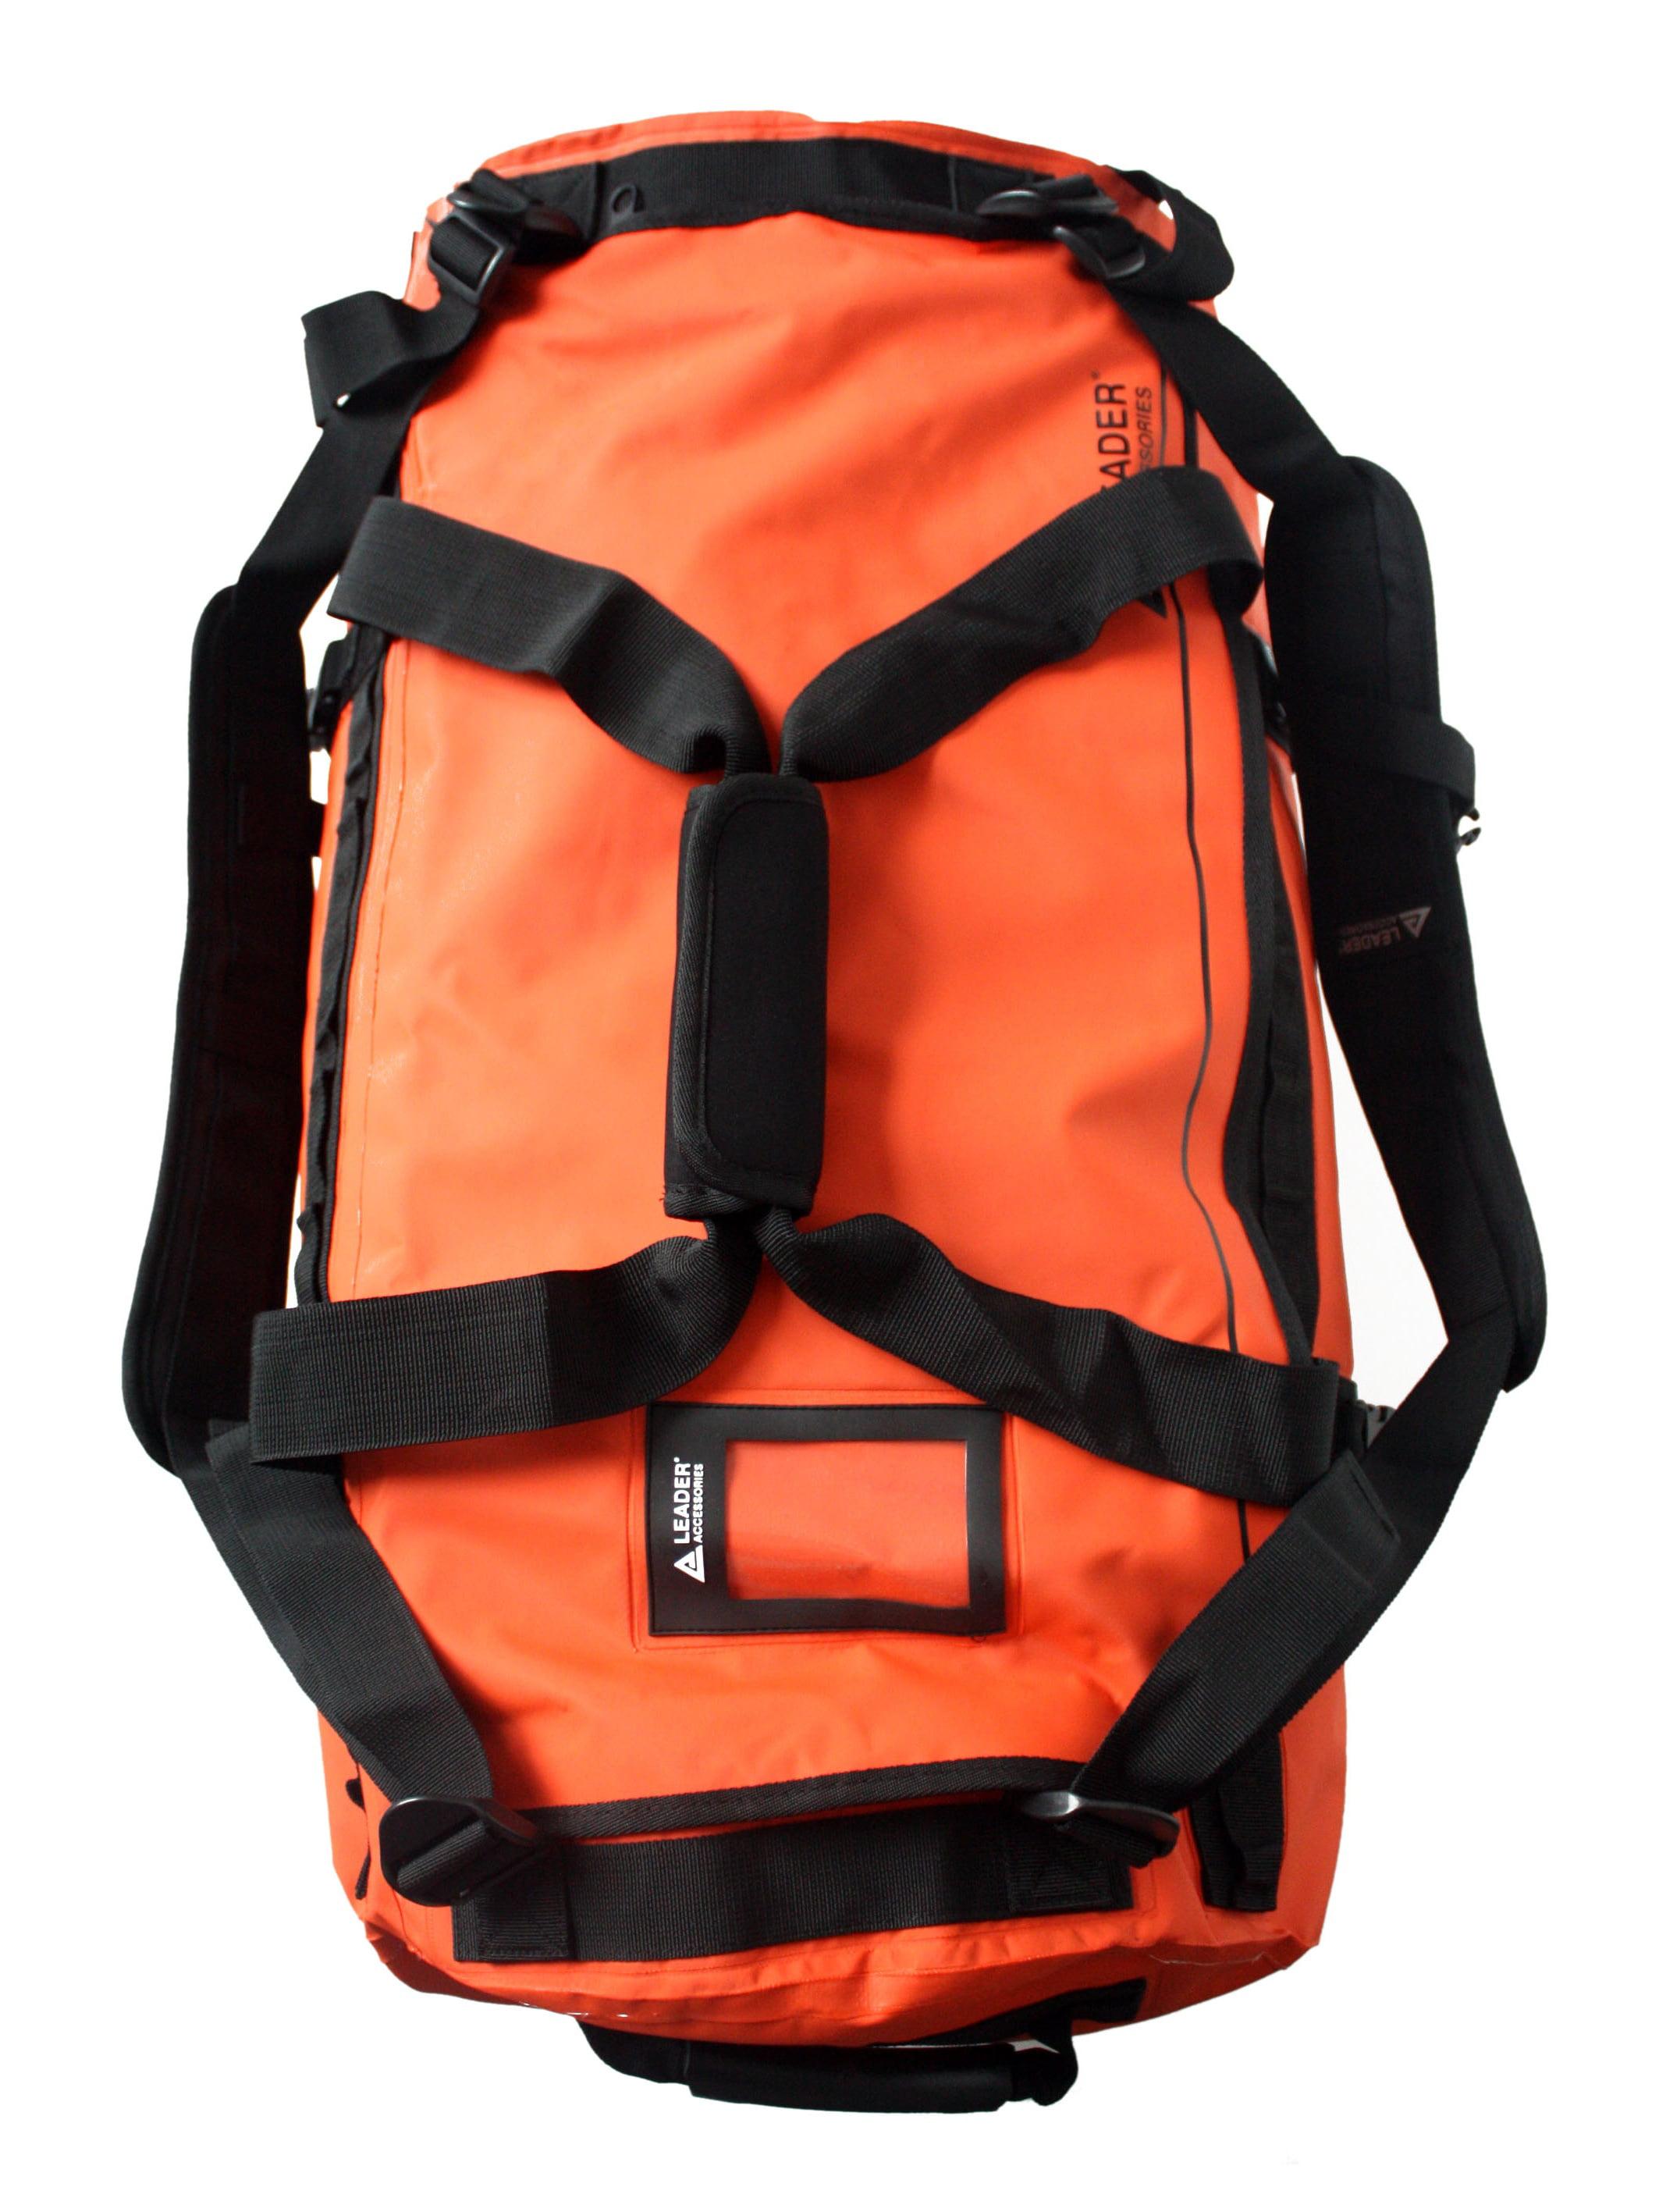 Leader Accessories Deluxe Waterproof PVC Tarpaulin Duffel Bag Backpack Dry  Bag 40l 70l 90l - Walmart.com c697f2b32e7c5